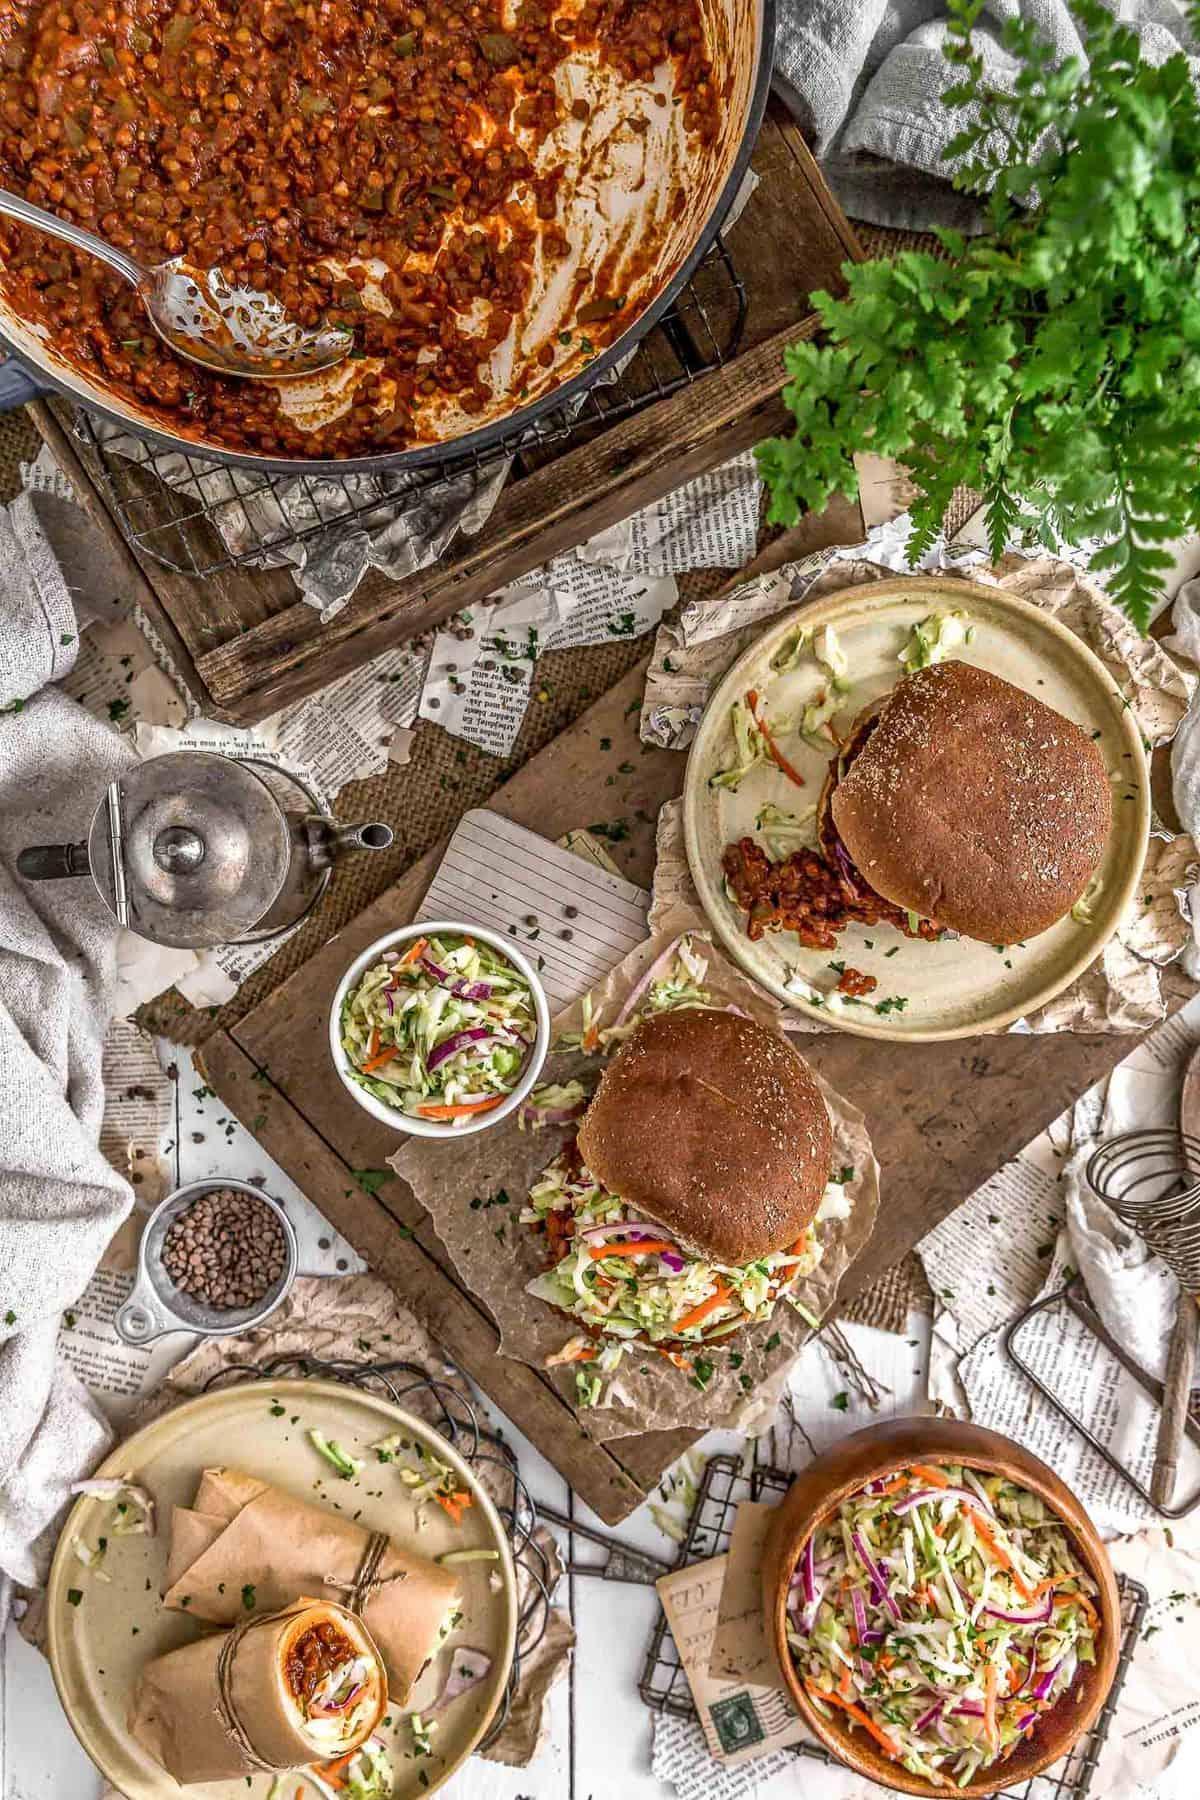 Tablescape of Vegan BBQ Lentil Sloppy Joes